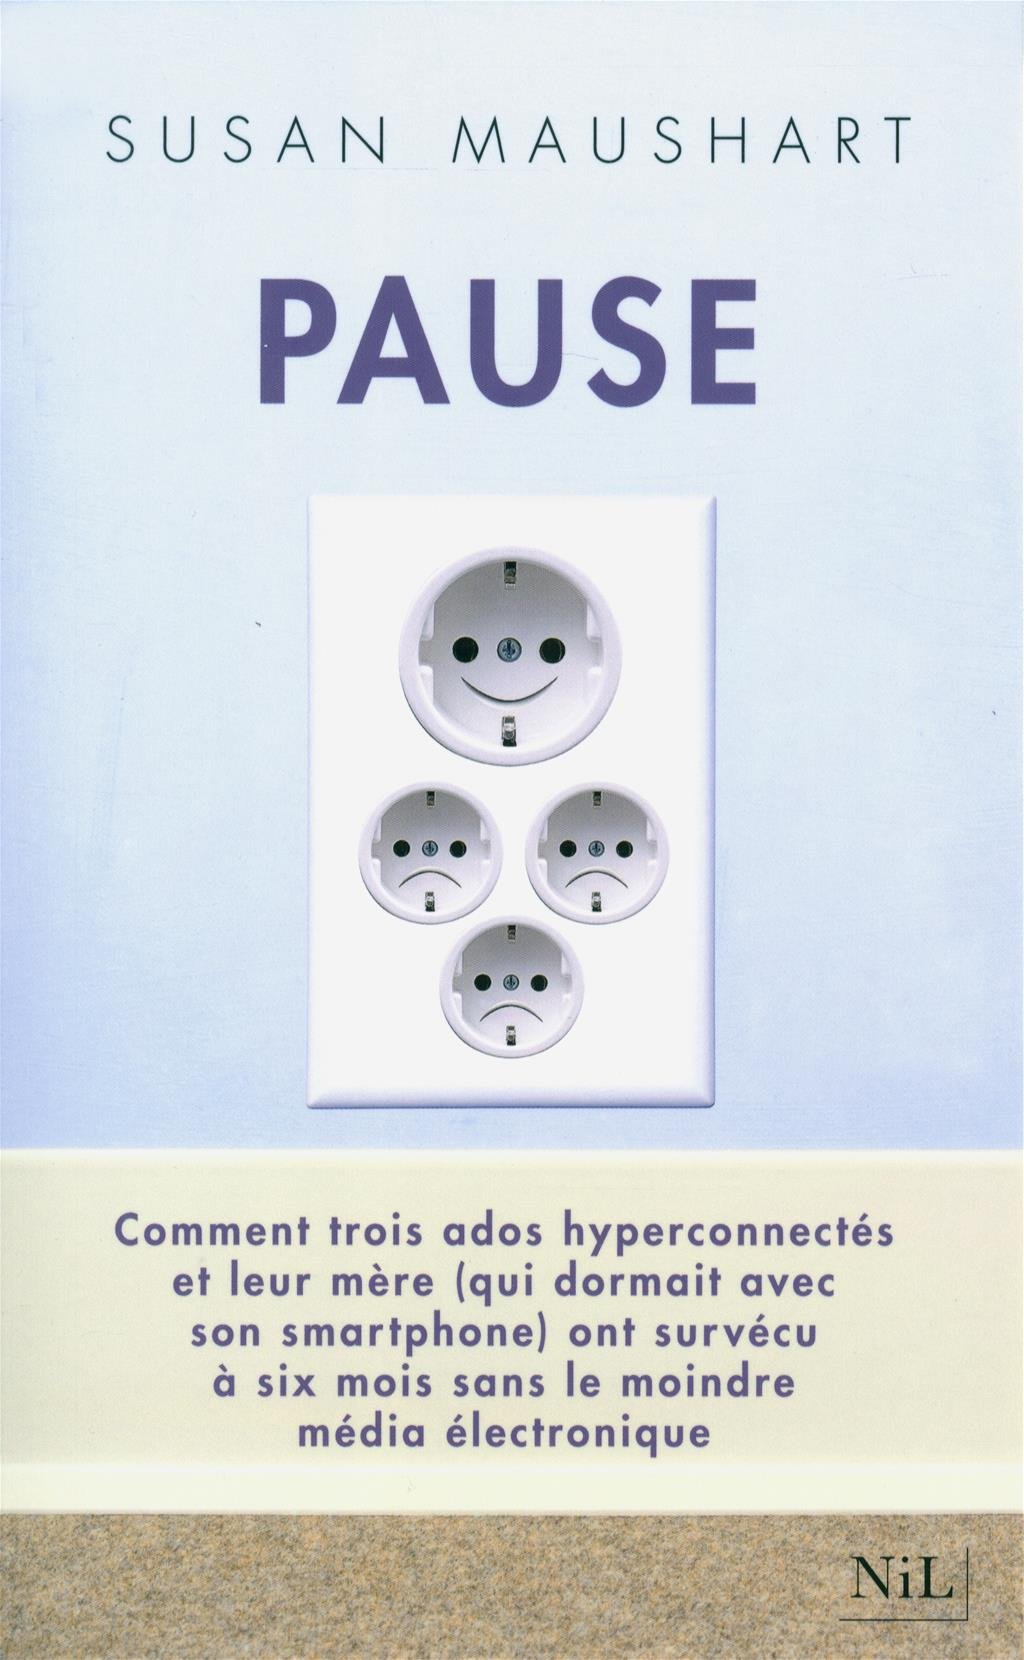 Susan Maushart - Pause